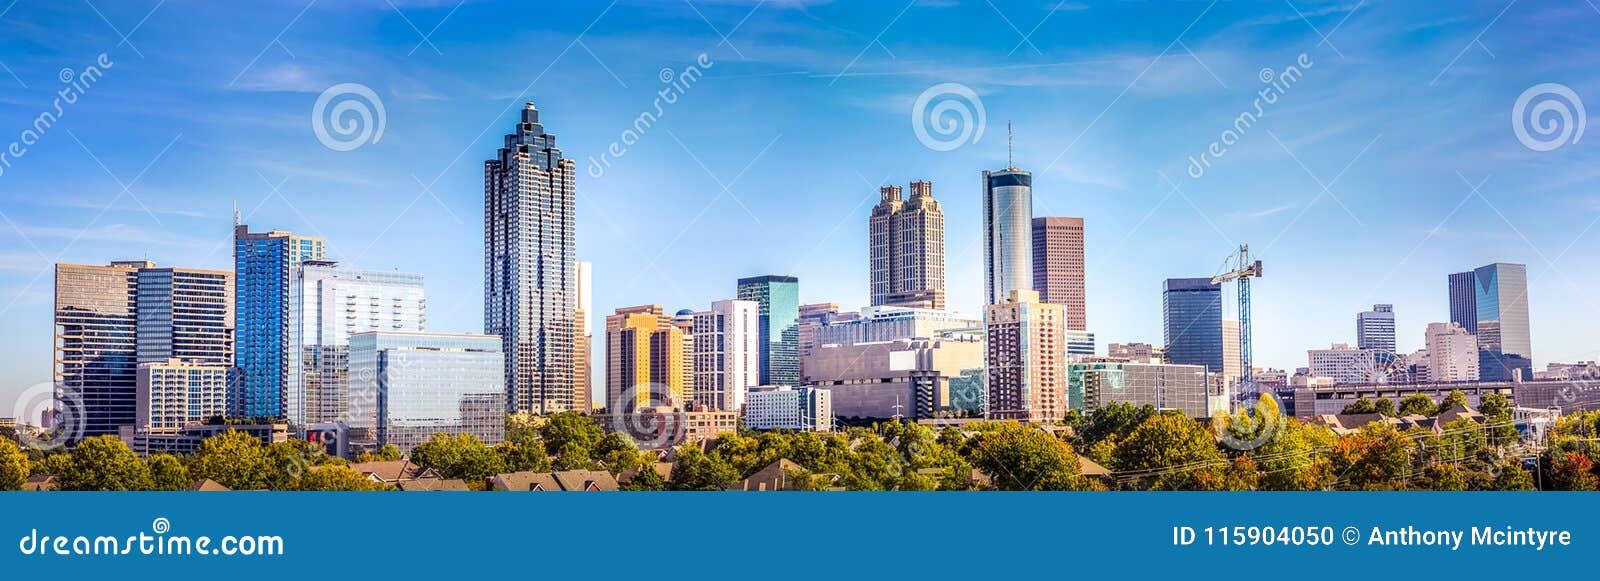 Dowtown Atlanta Georgia Skyline